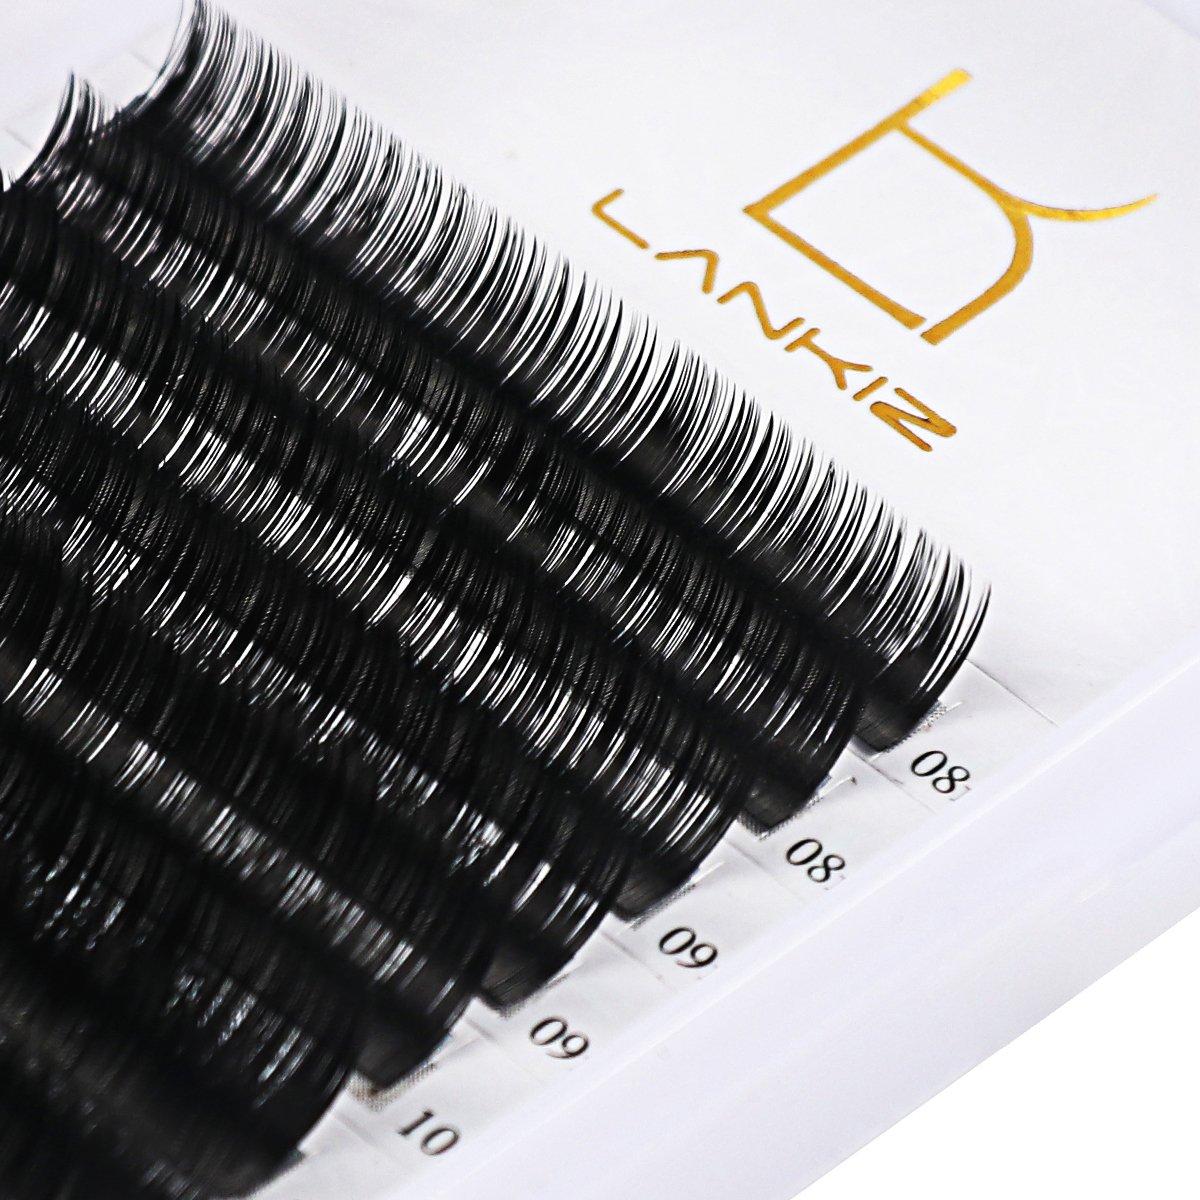 Eyelash Extensions C Curl 0.07mm Mixed Tray Volume Eyelashes Natural Light False Mink Lash Individual Eyelashes Extension Salon Perfect Use By Lk Lankiz. by Lk Lankiz